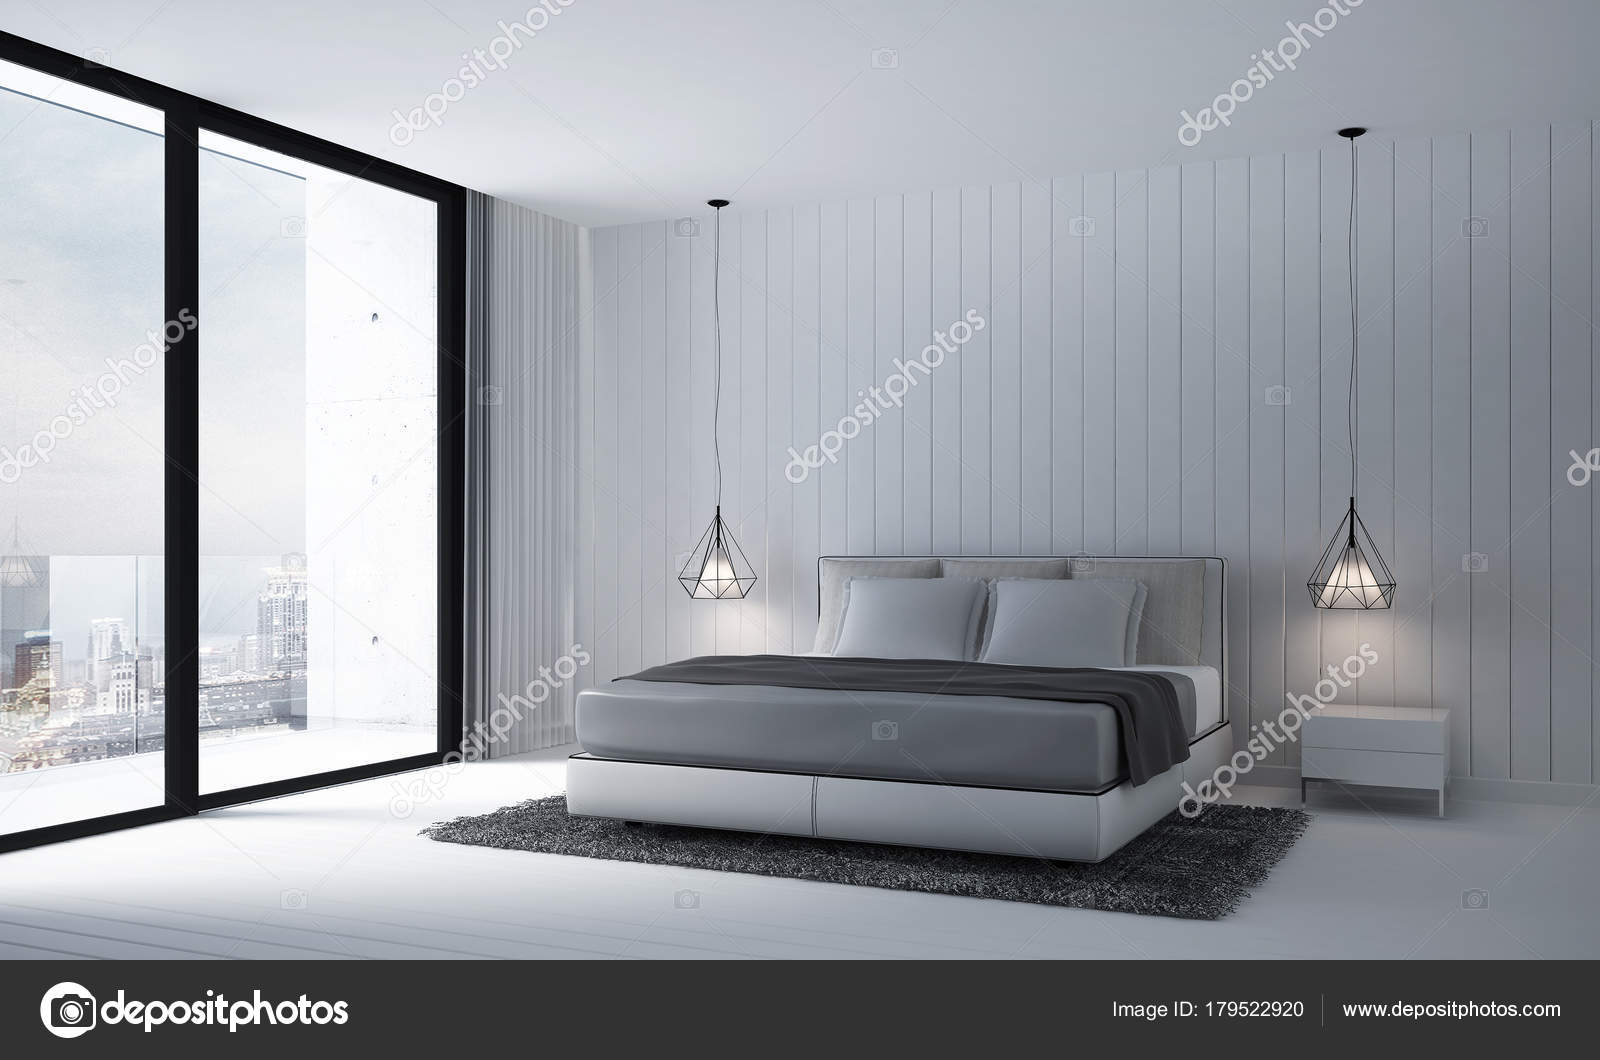 Rendu Décoration Fond Texture Moderne Chambre Coucher Mur ...